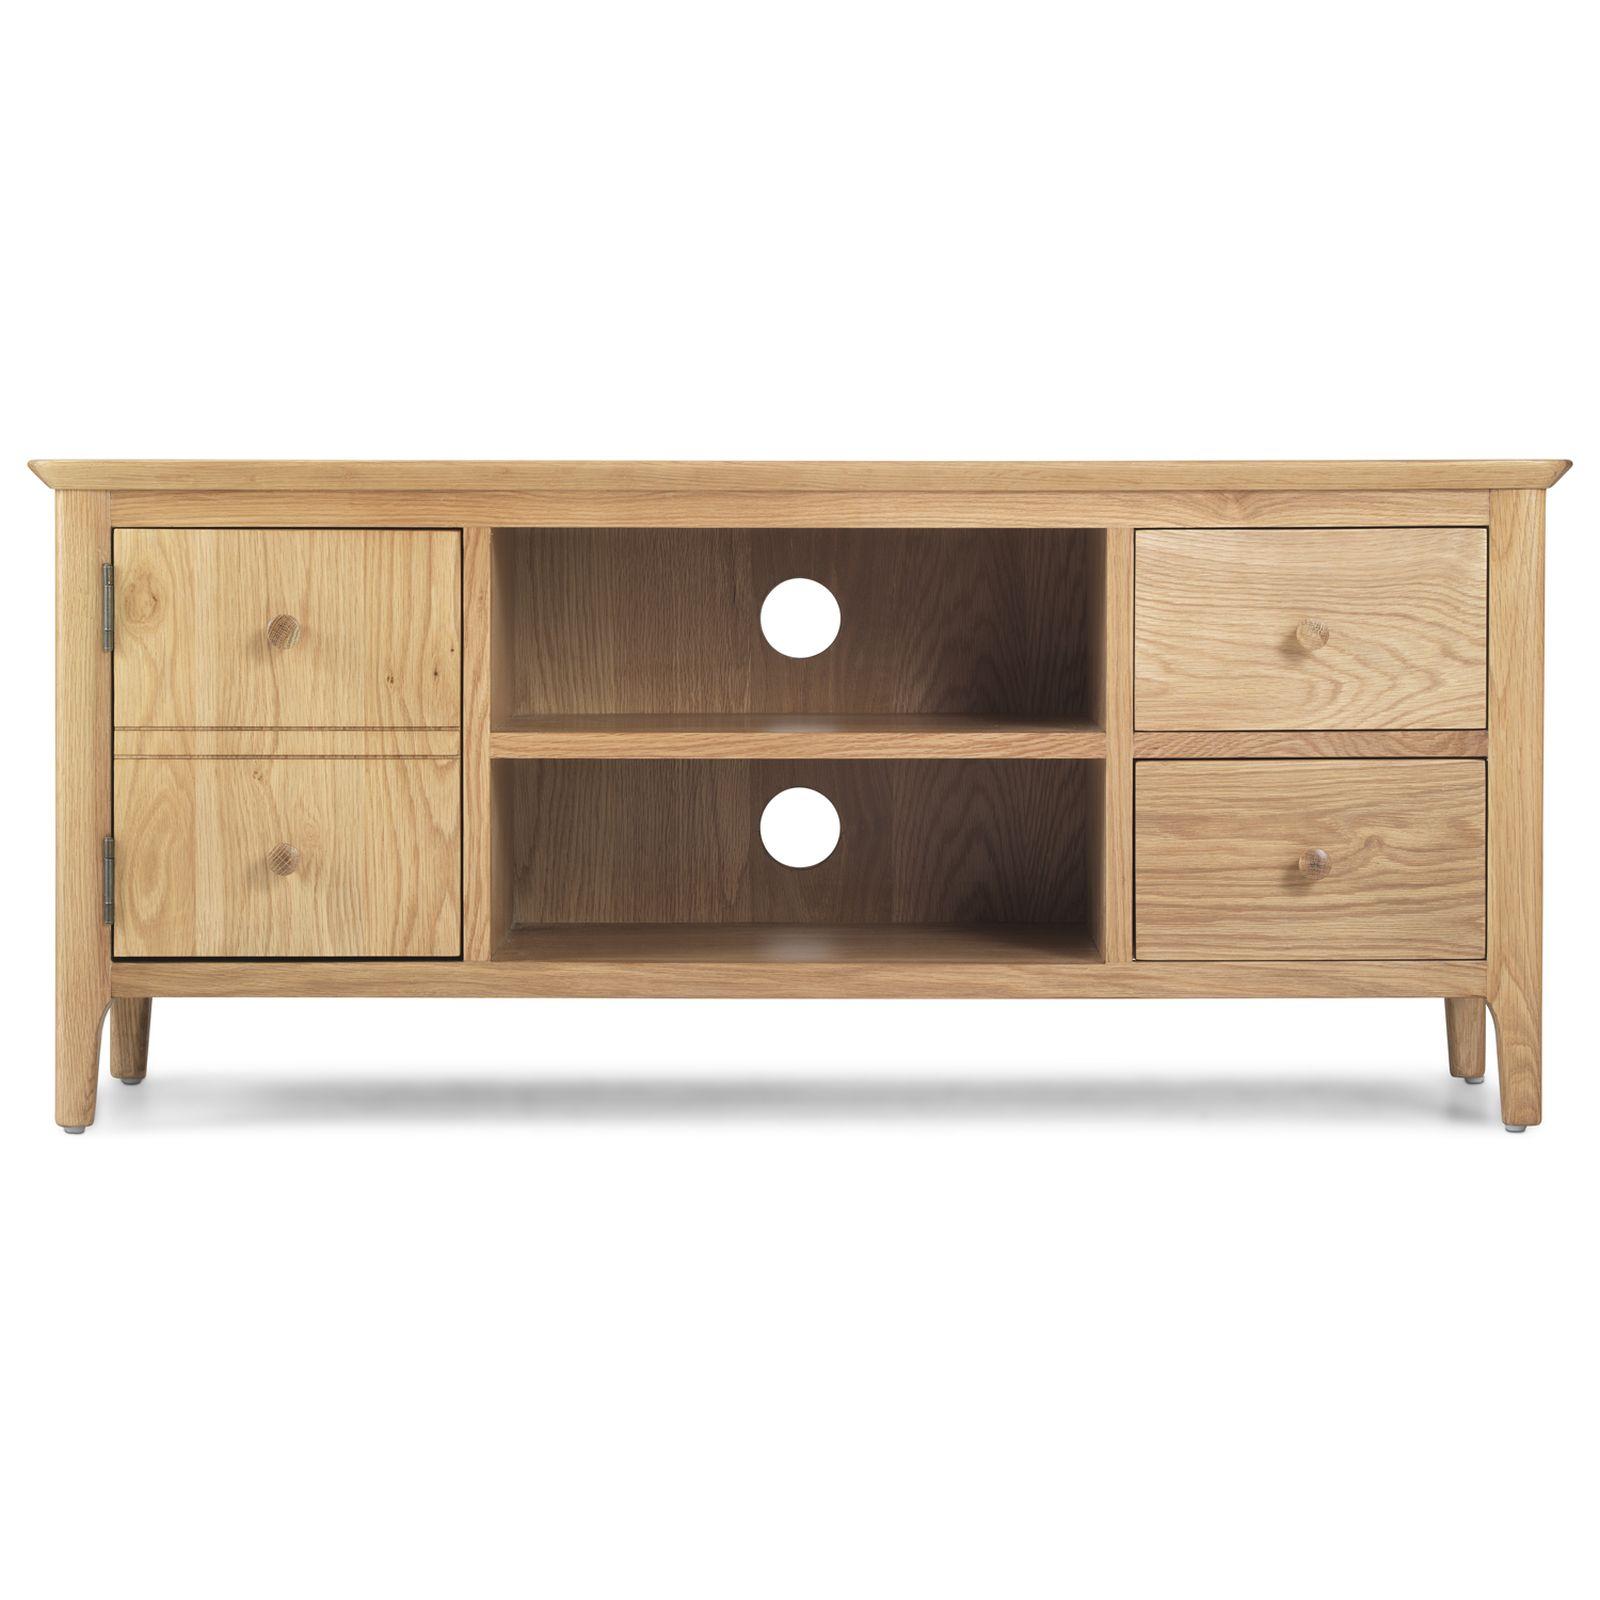 Ferndale solid oak furniture large widescreen TV cabinet stand unit  eBay -> Oak Tv Sideboard Unit